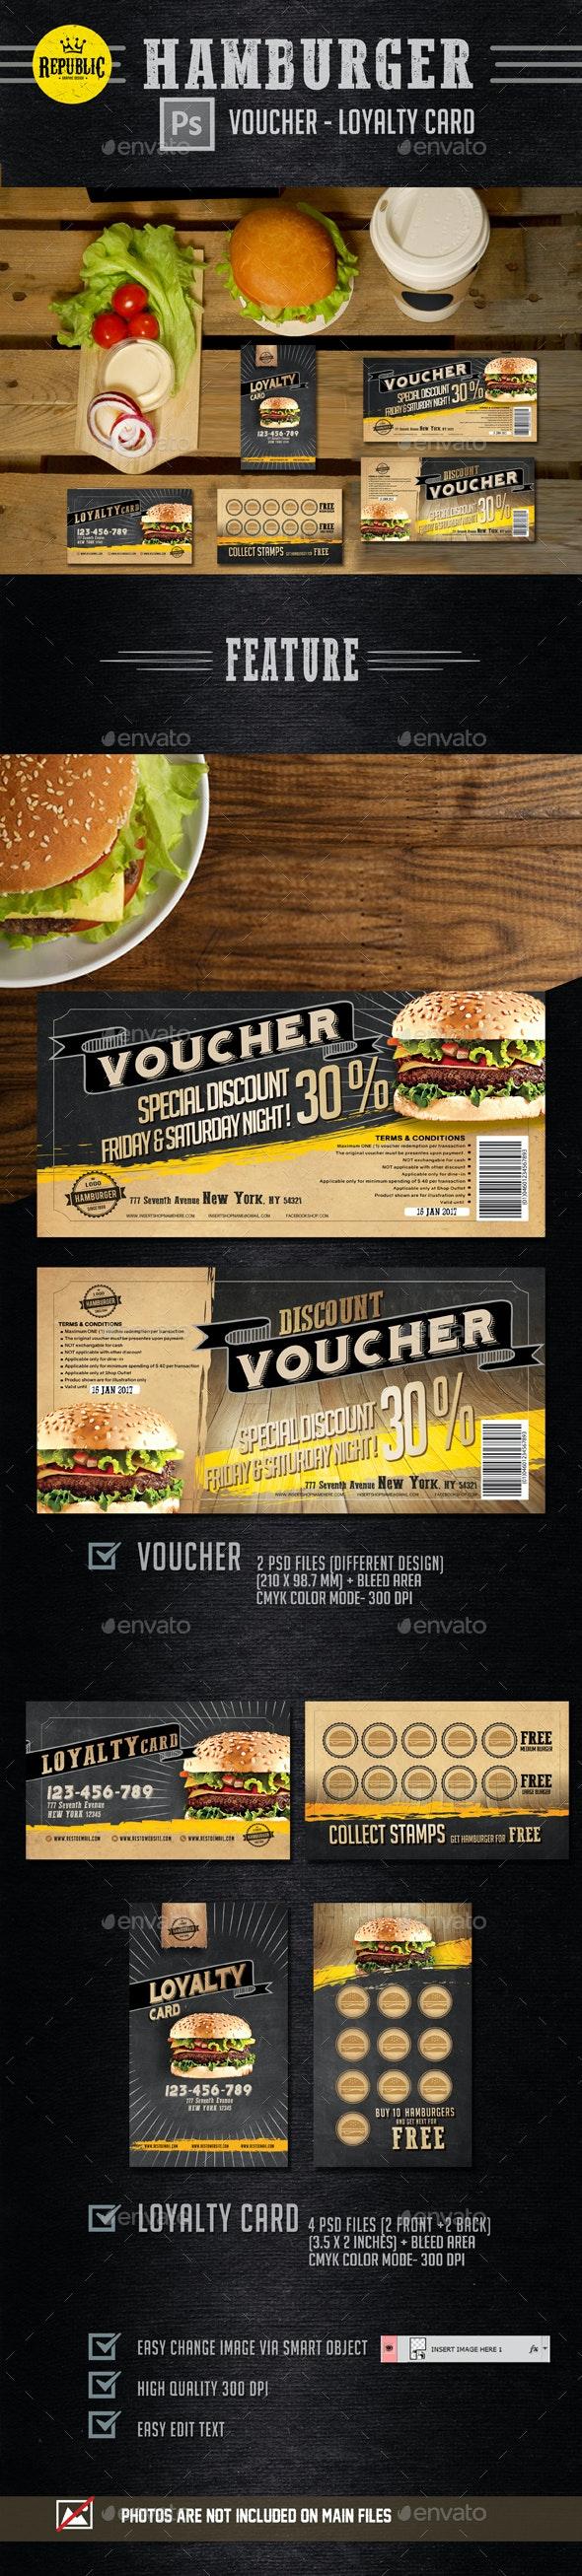 Hamburger Voucher Loyalty Card - Retro/Vintage Business Cards